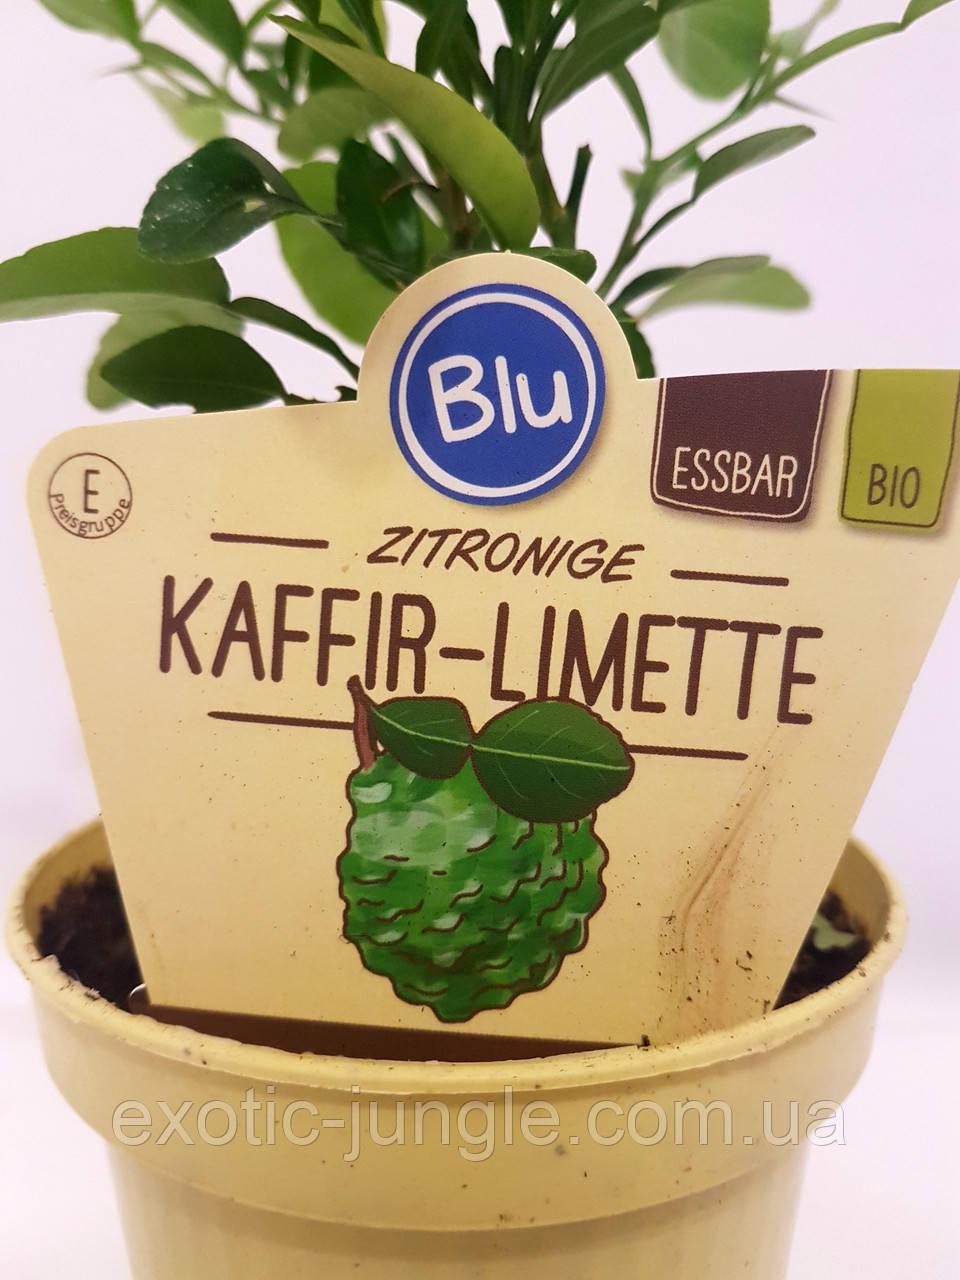 Лайм Кафрский, Хистрикс (Kaffir Lime, Citrus hystrix) 30-35 см. Комнатный. Куст (пр.Италия), фото 1